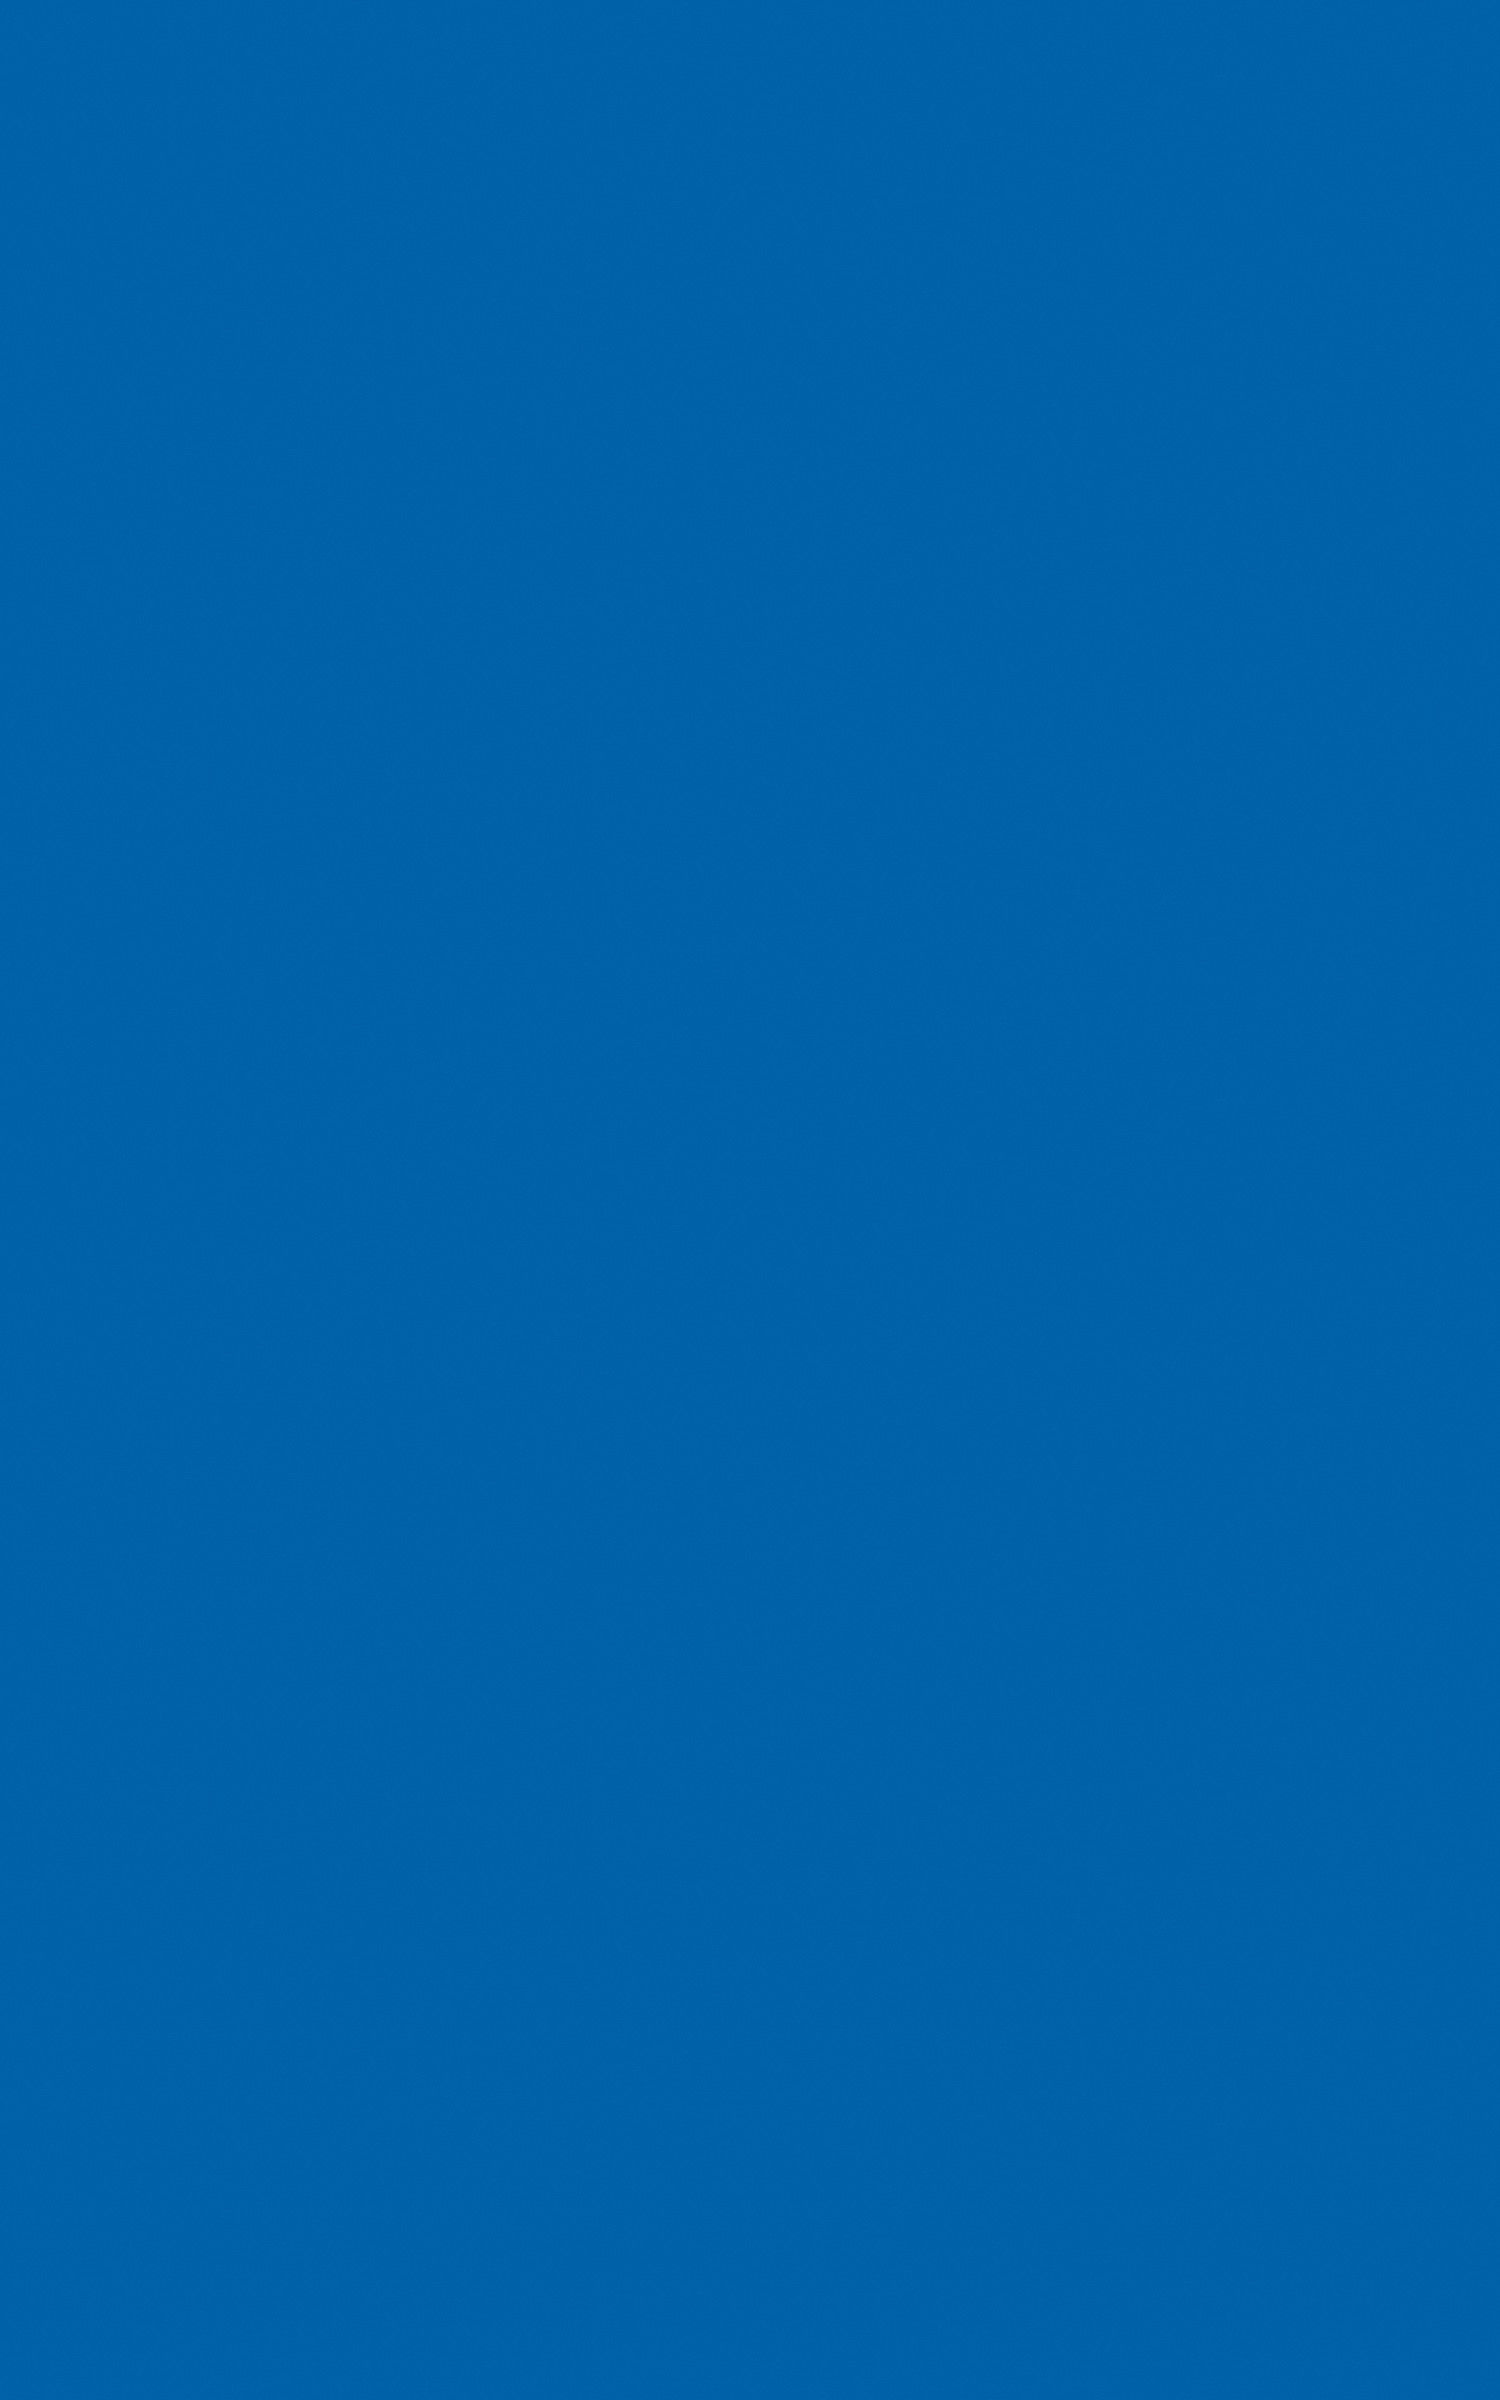 Bleu Flash Fond Couleur Fond D Ecran Telephone Ecran Bleu